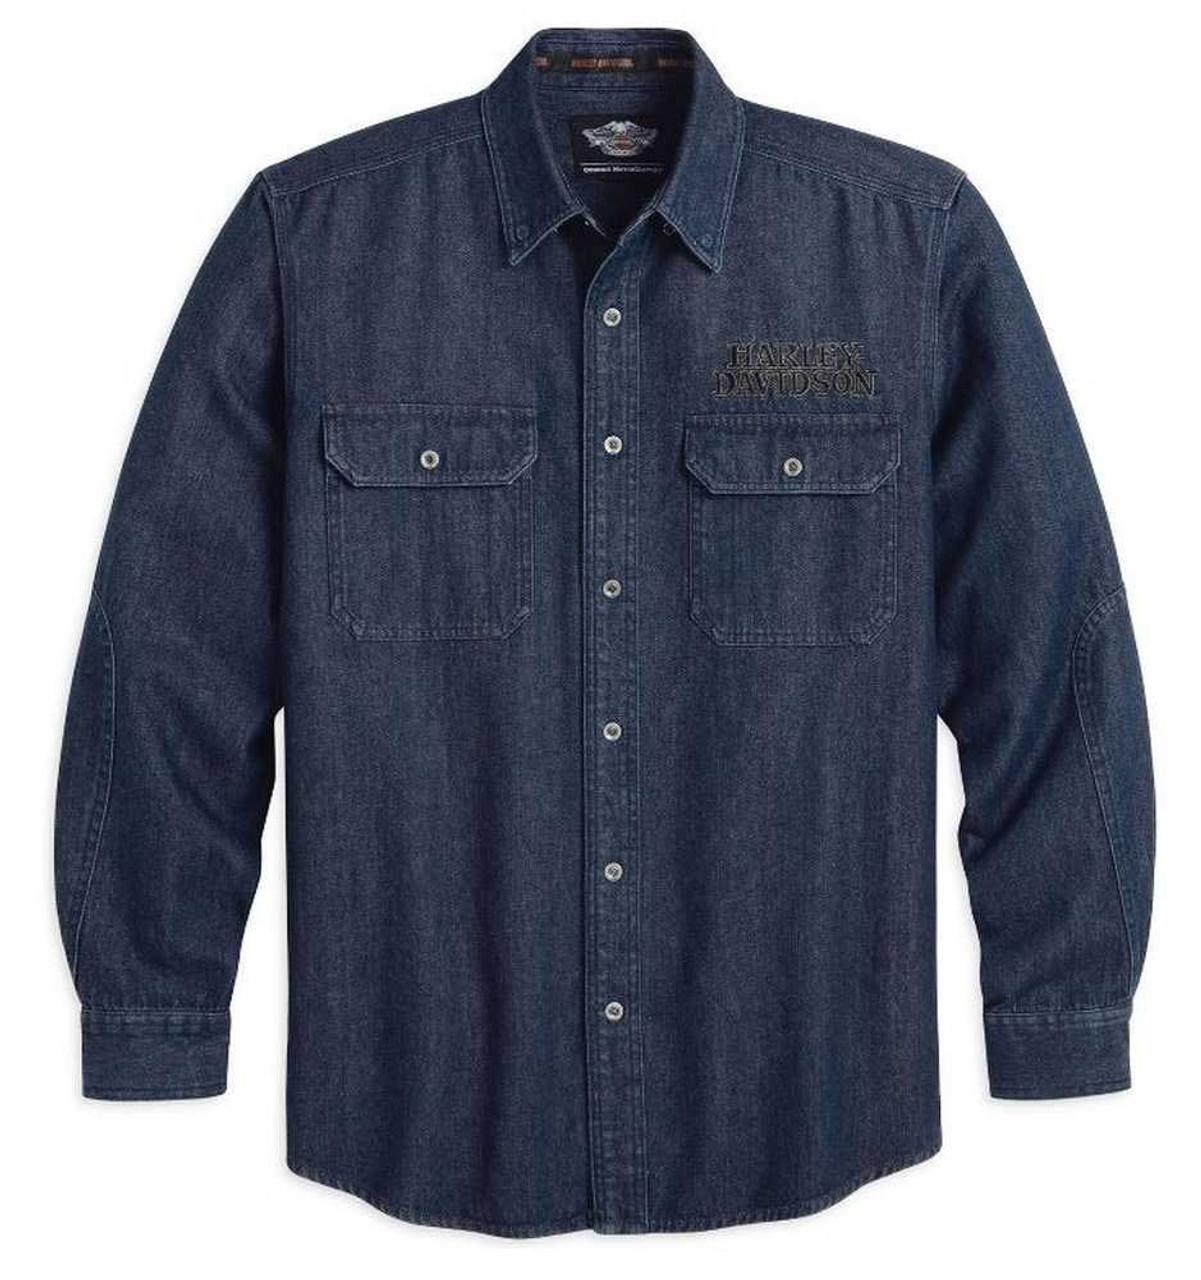 Harley Davidson BLUE Denim SNAP  Button  Shirt Collar Snaps Pockets Mens Sz XL